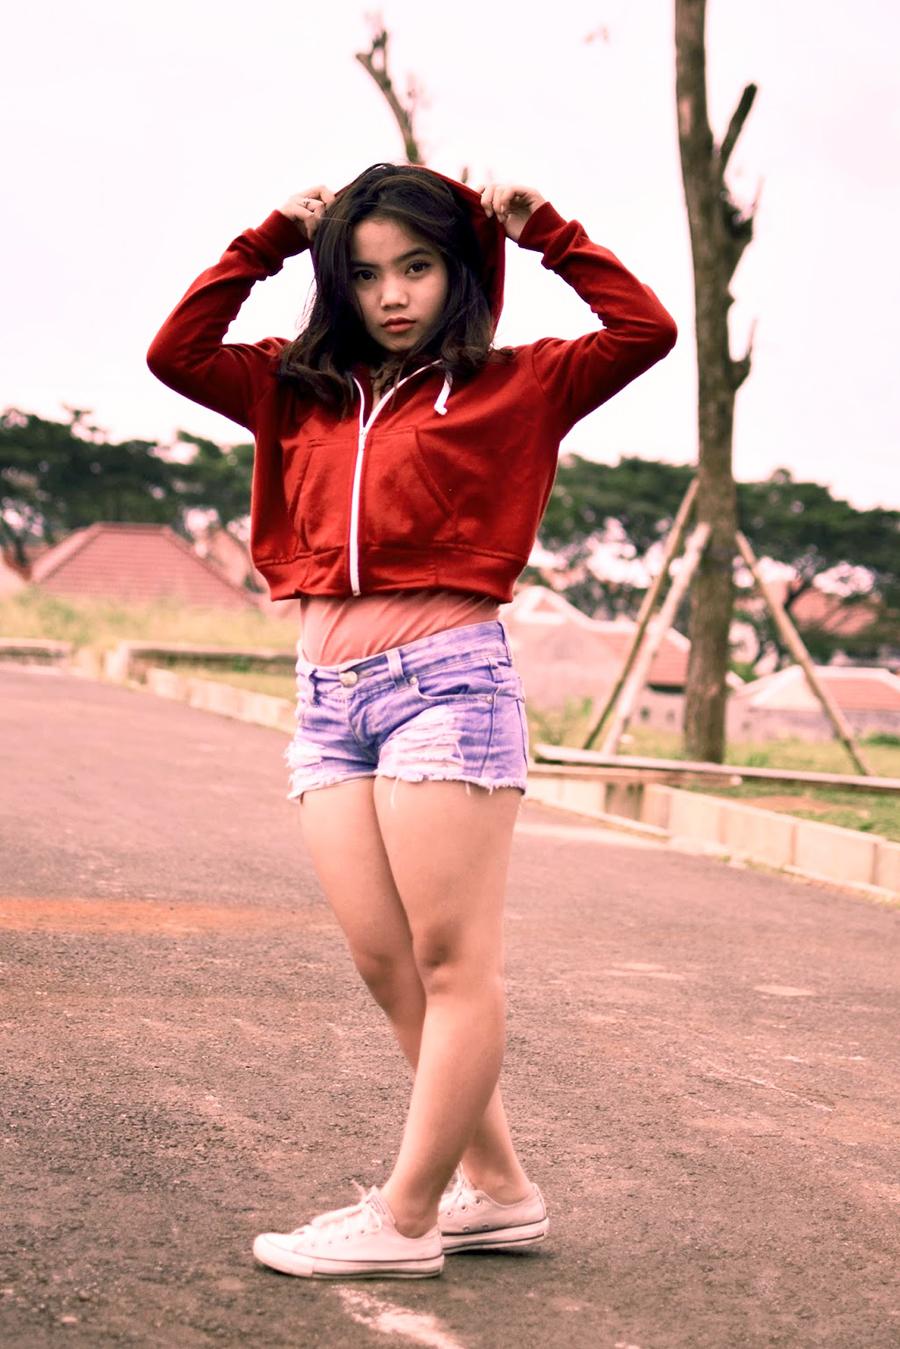 foto model IGO Sella ABG Malang tembem